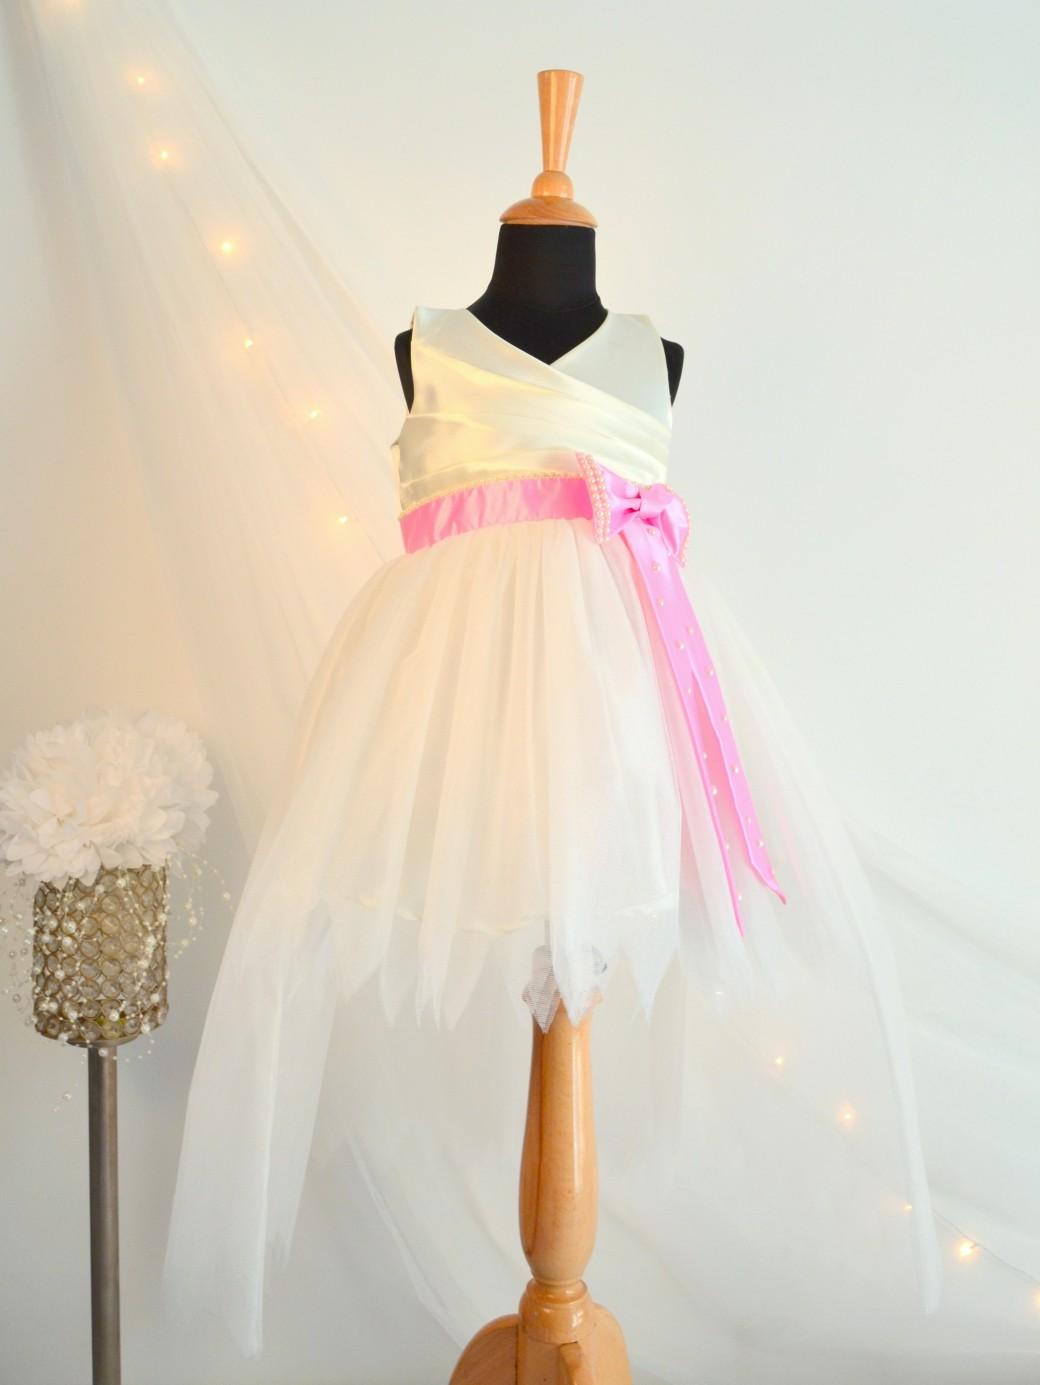 TBT0015 1 TBT High-Low Bow Dress